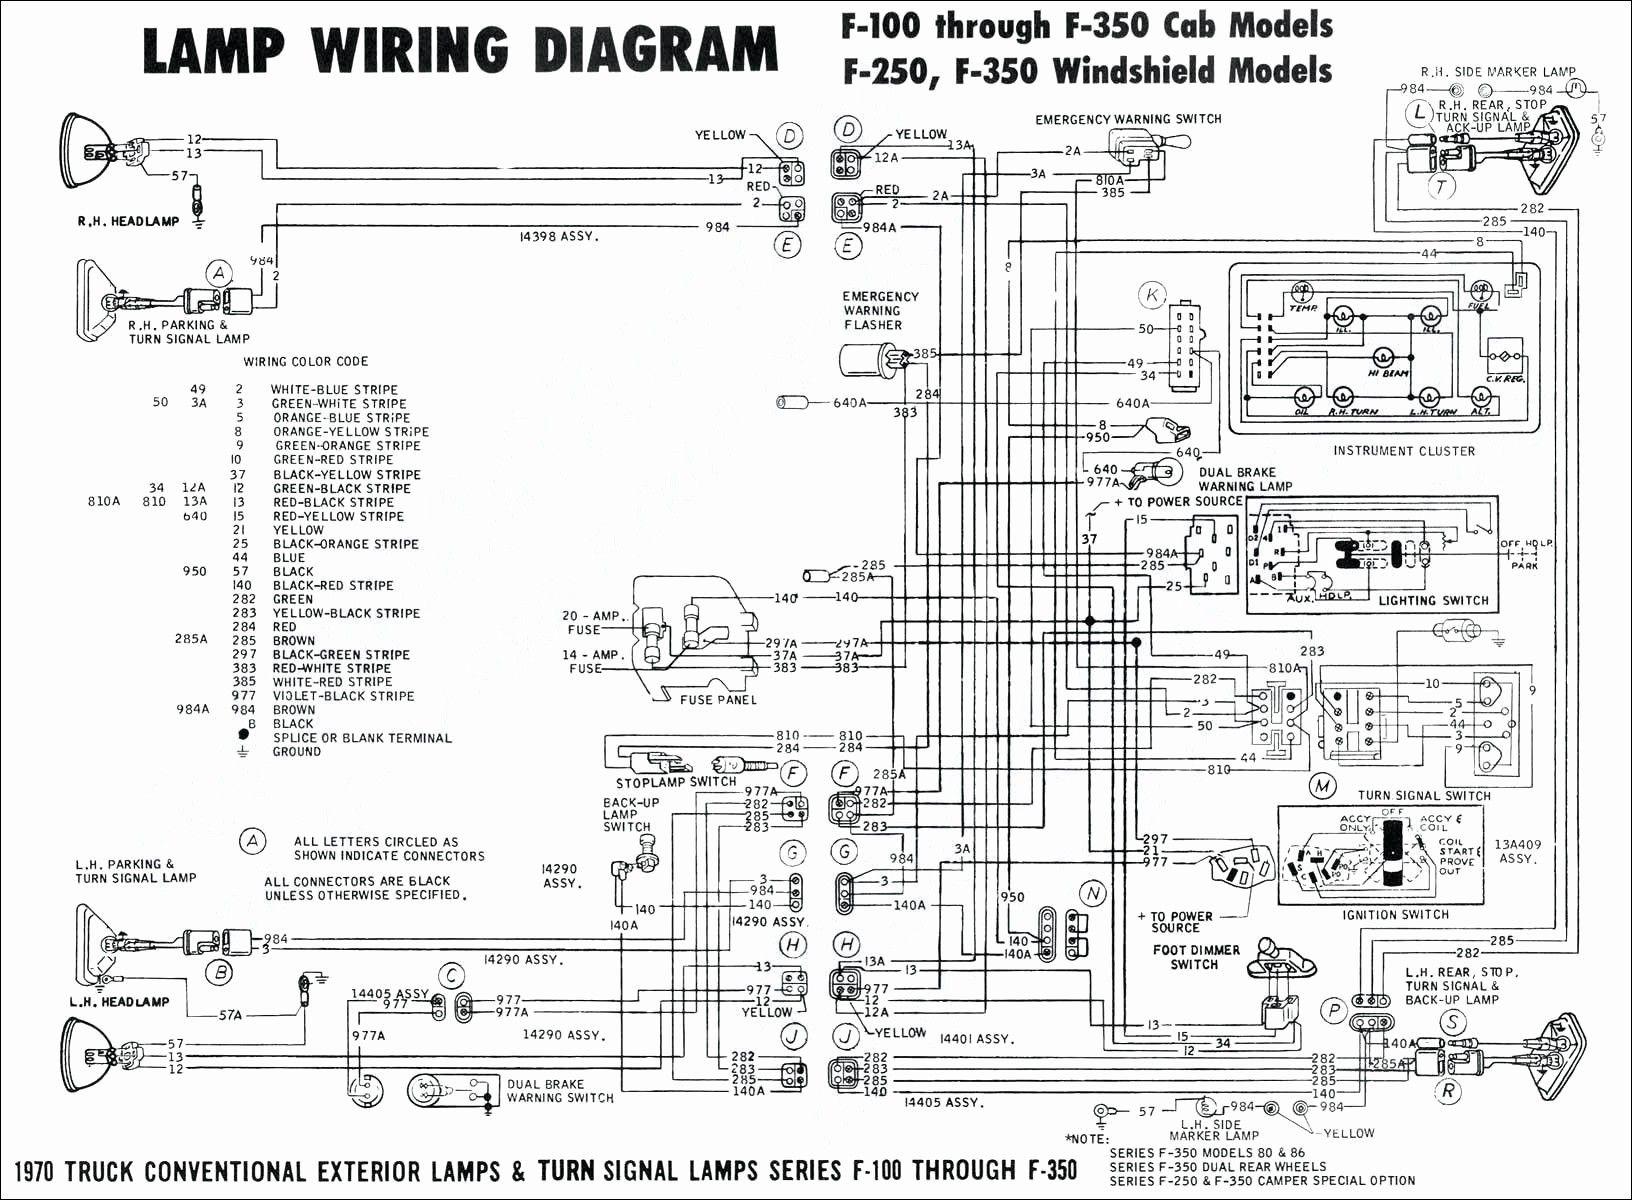 Kib Monitor Panel Diaghram Trailer Wiring Diagram Electrical Wiring Diagram Circuit Diagram